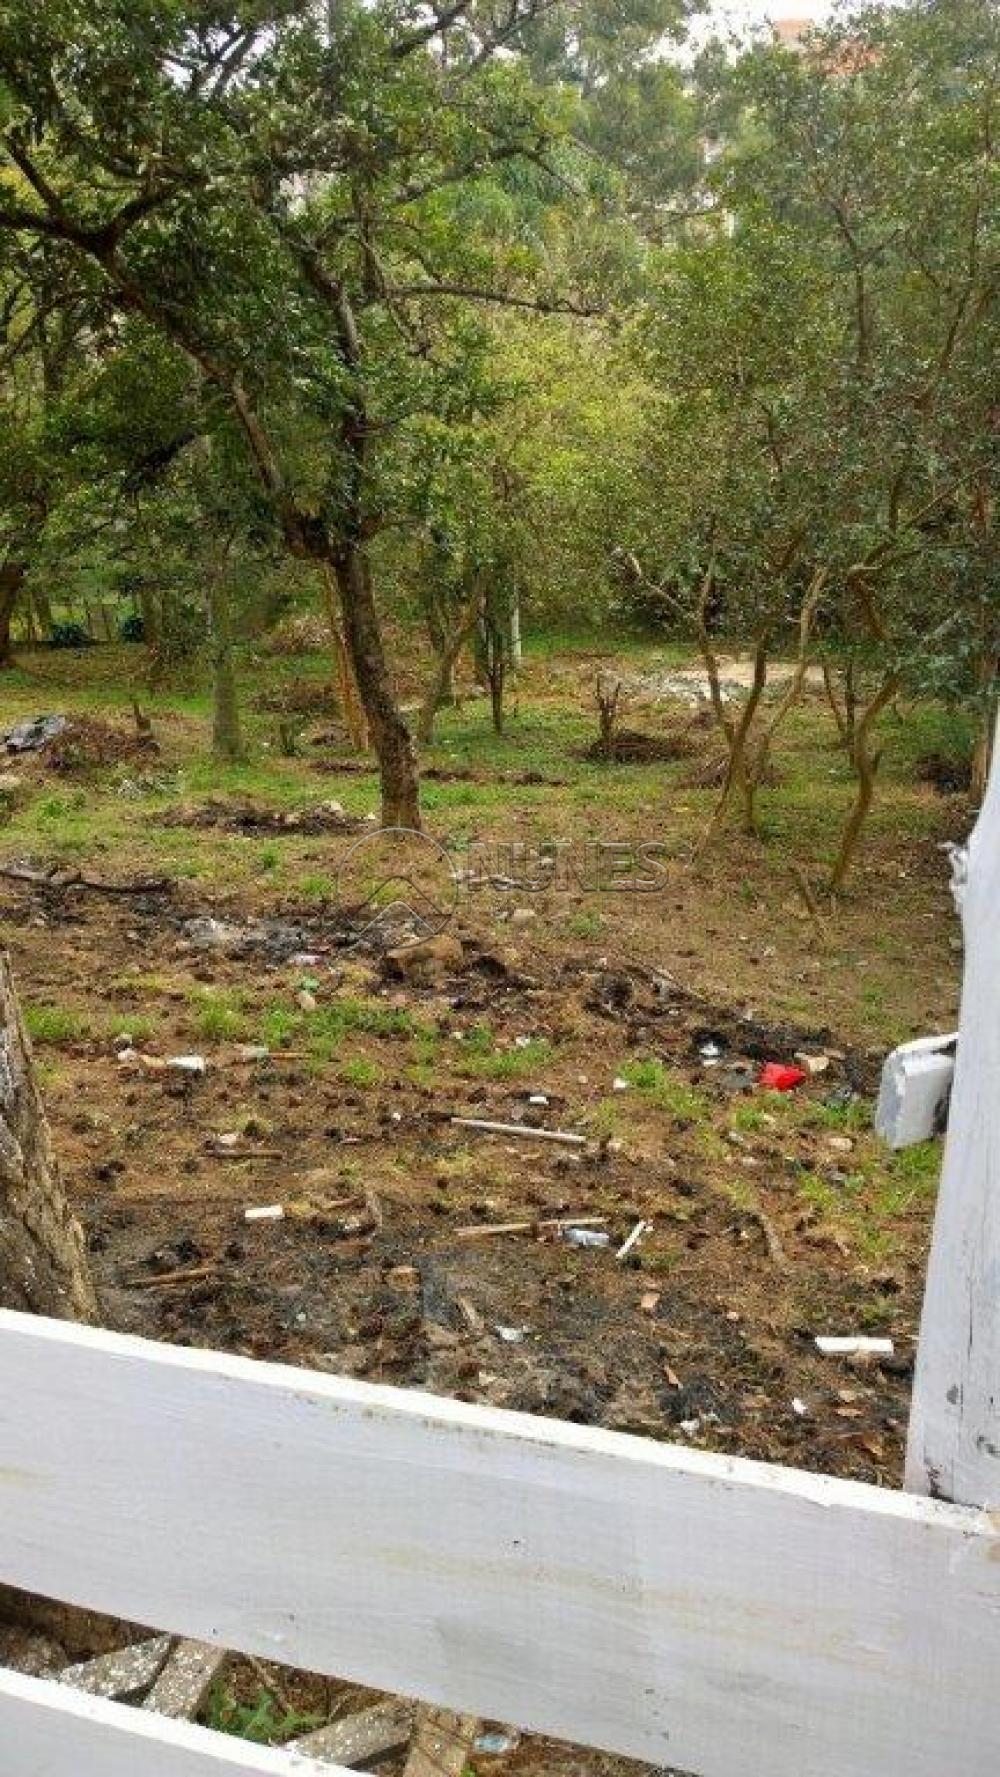 Comprar Terreno / Terreno em Itapevi apenas R$ 550.000,00 - Foto 10